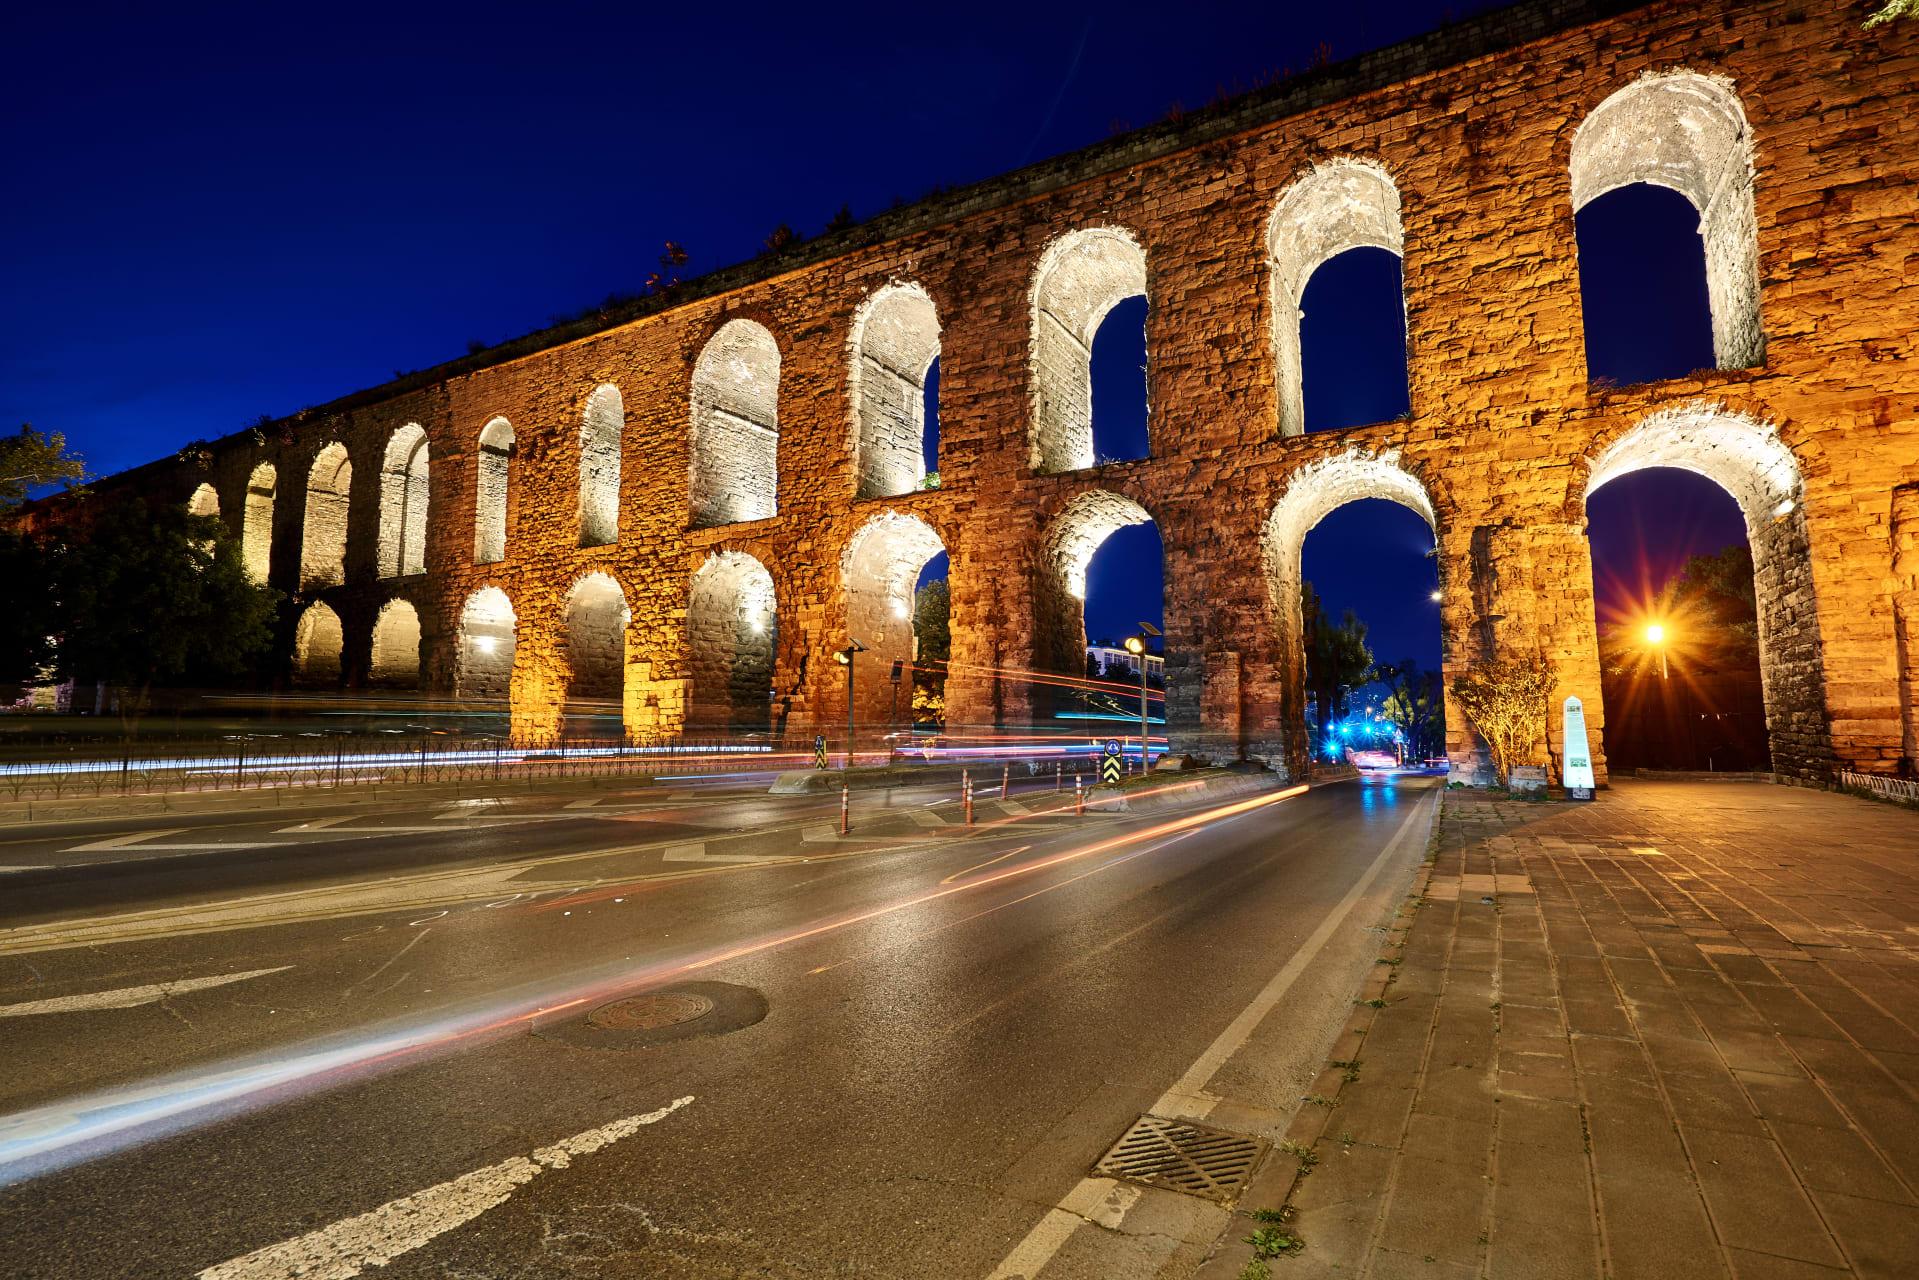 Istanbul - Roman Aqueduct & Ottoman Prince Mosque